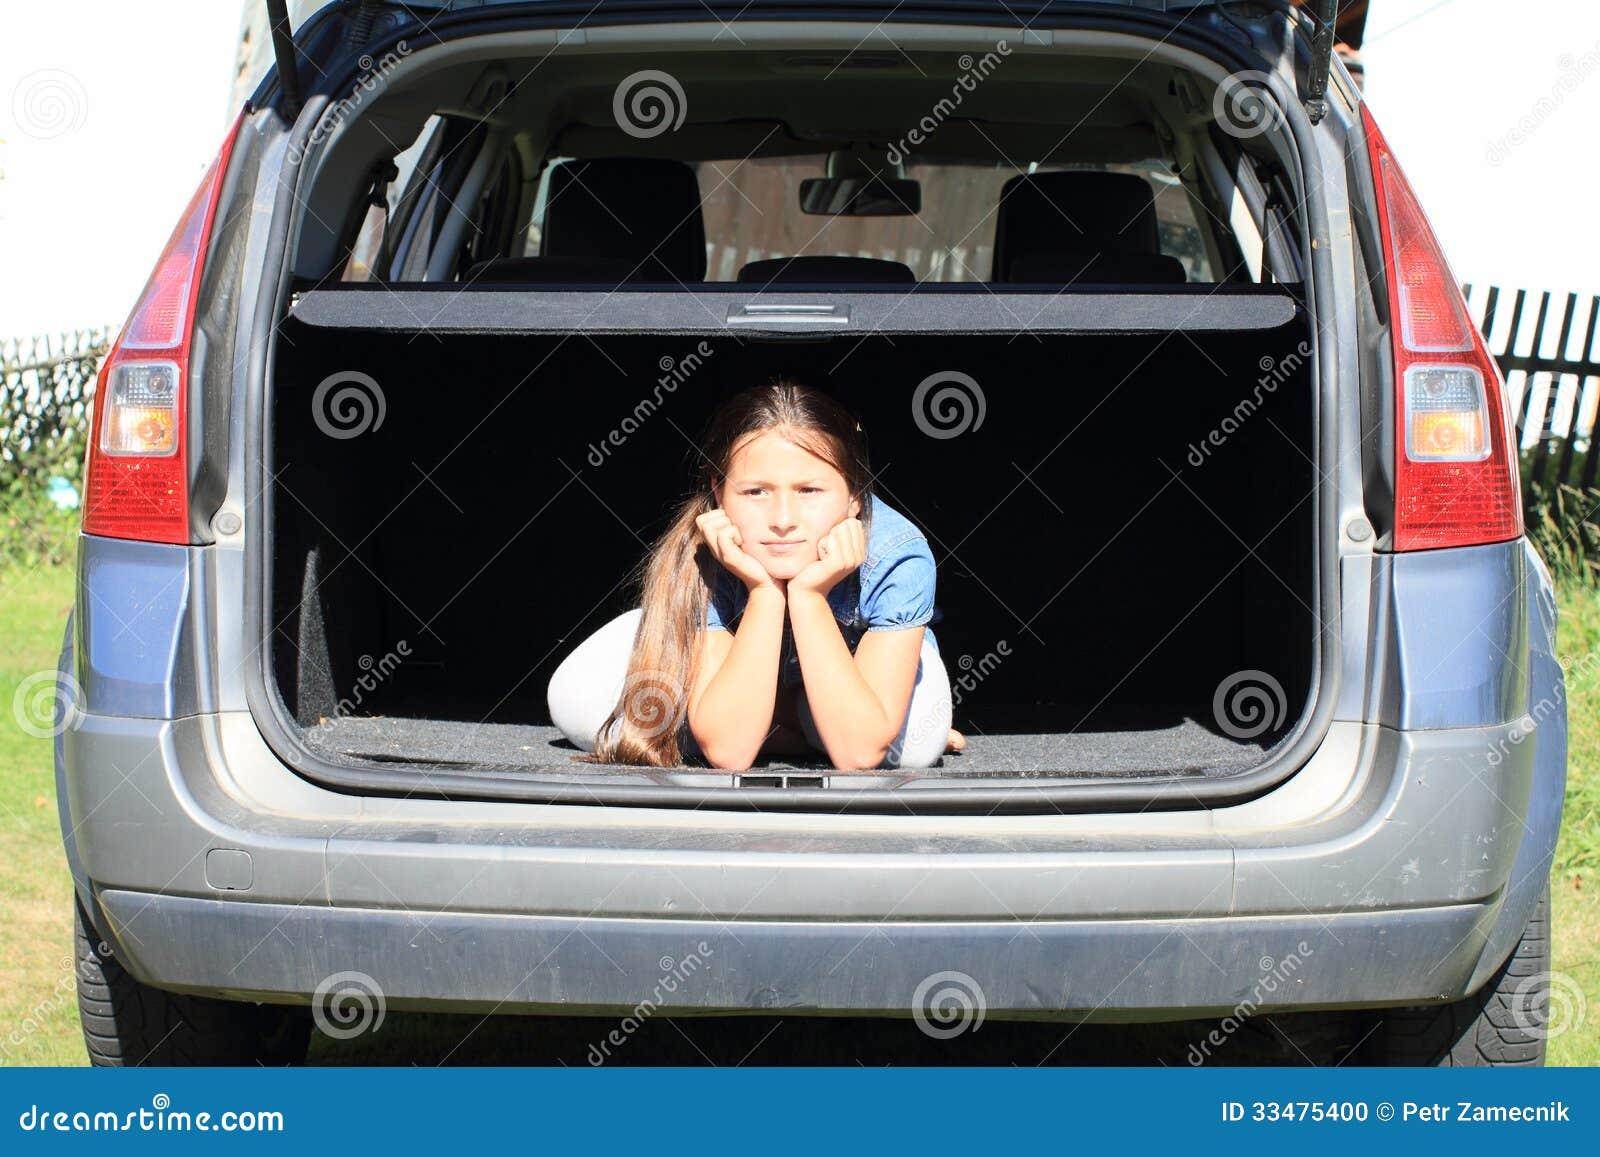 nude in car trunk